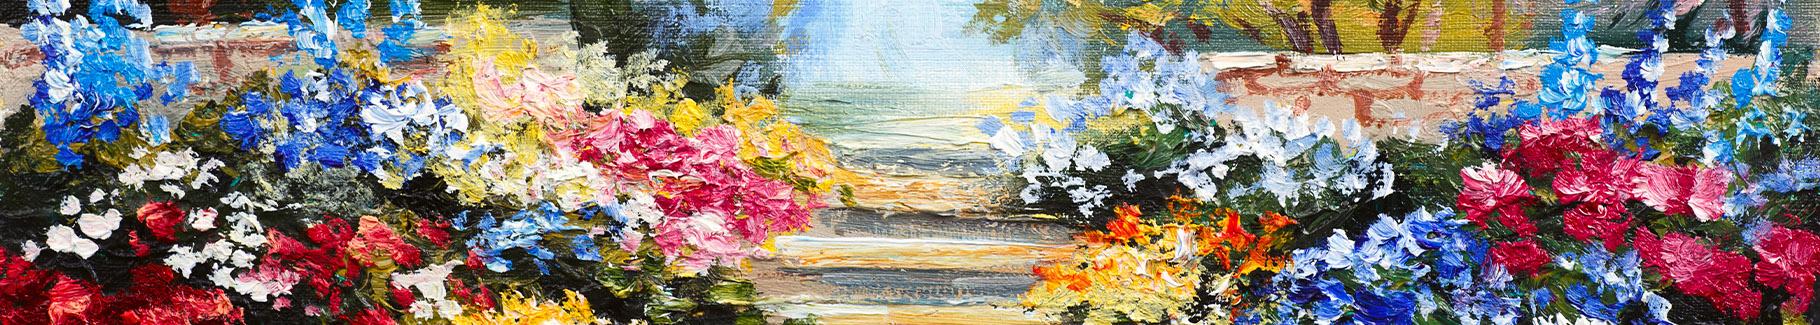 Wiosenny obraz natura